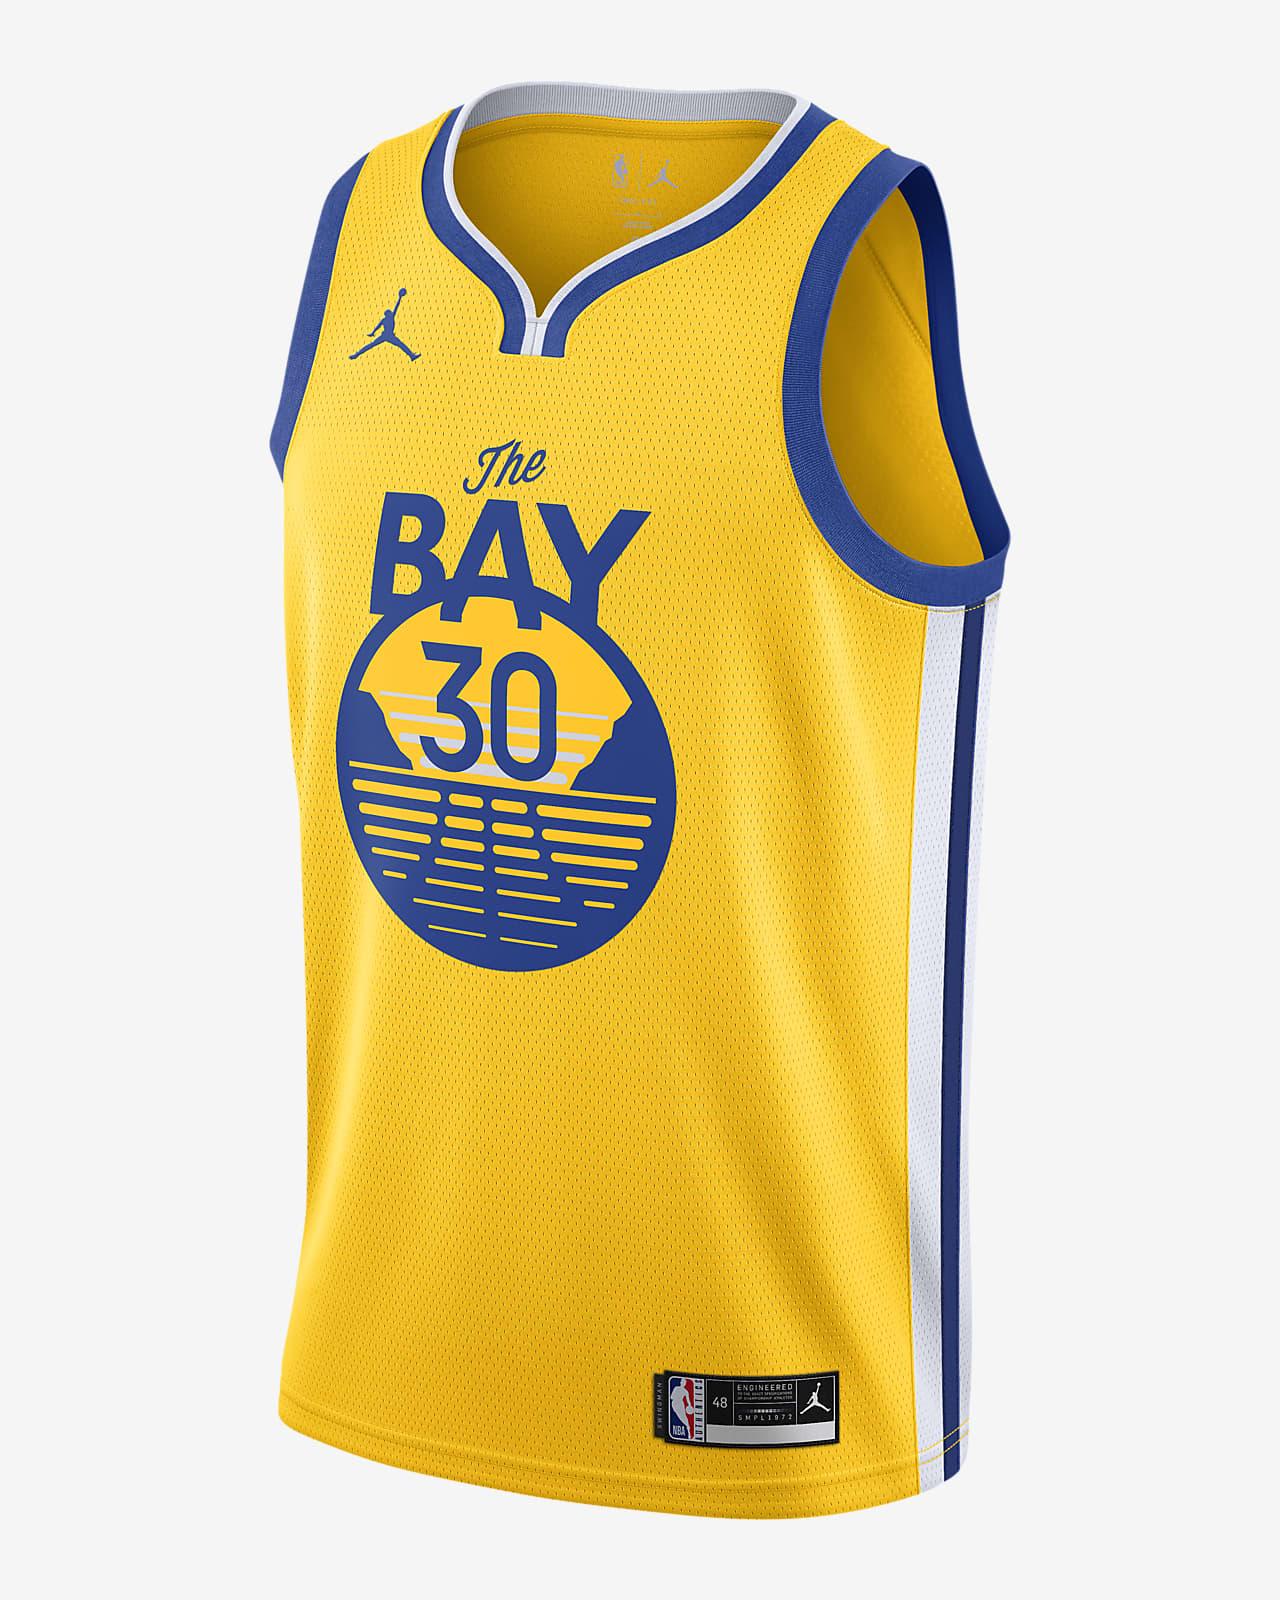 Camisola NBA da Jordan Swingman Stephen Curry Warriors Statement Edition 2020